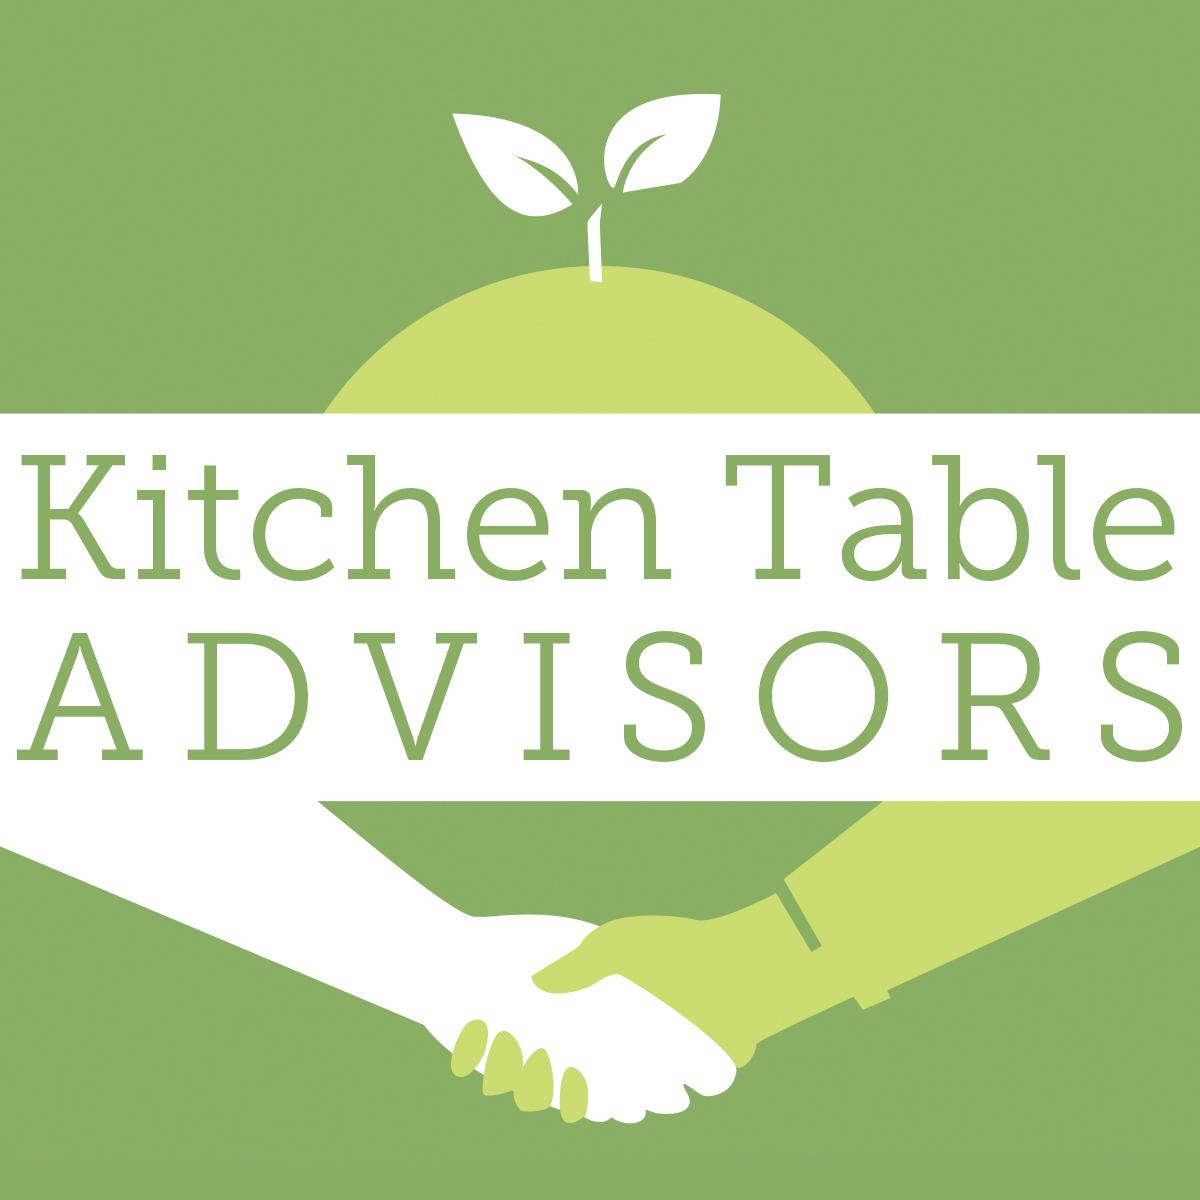 kitchentableadvisors the kitchen table